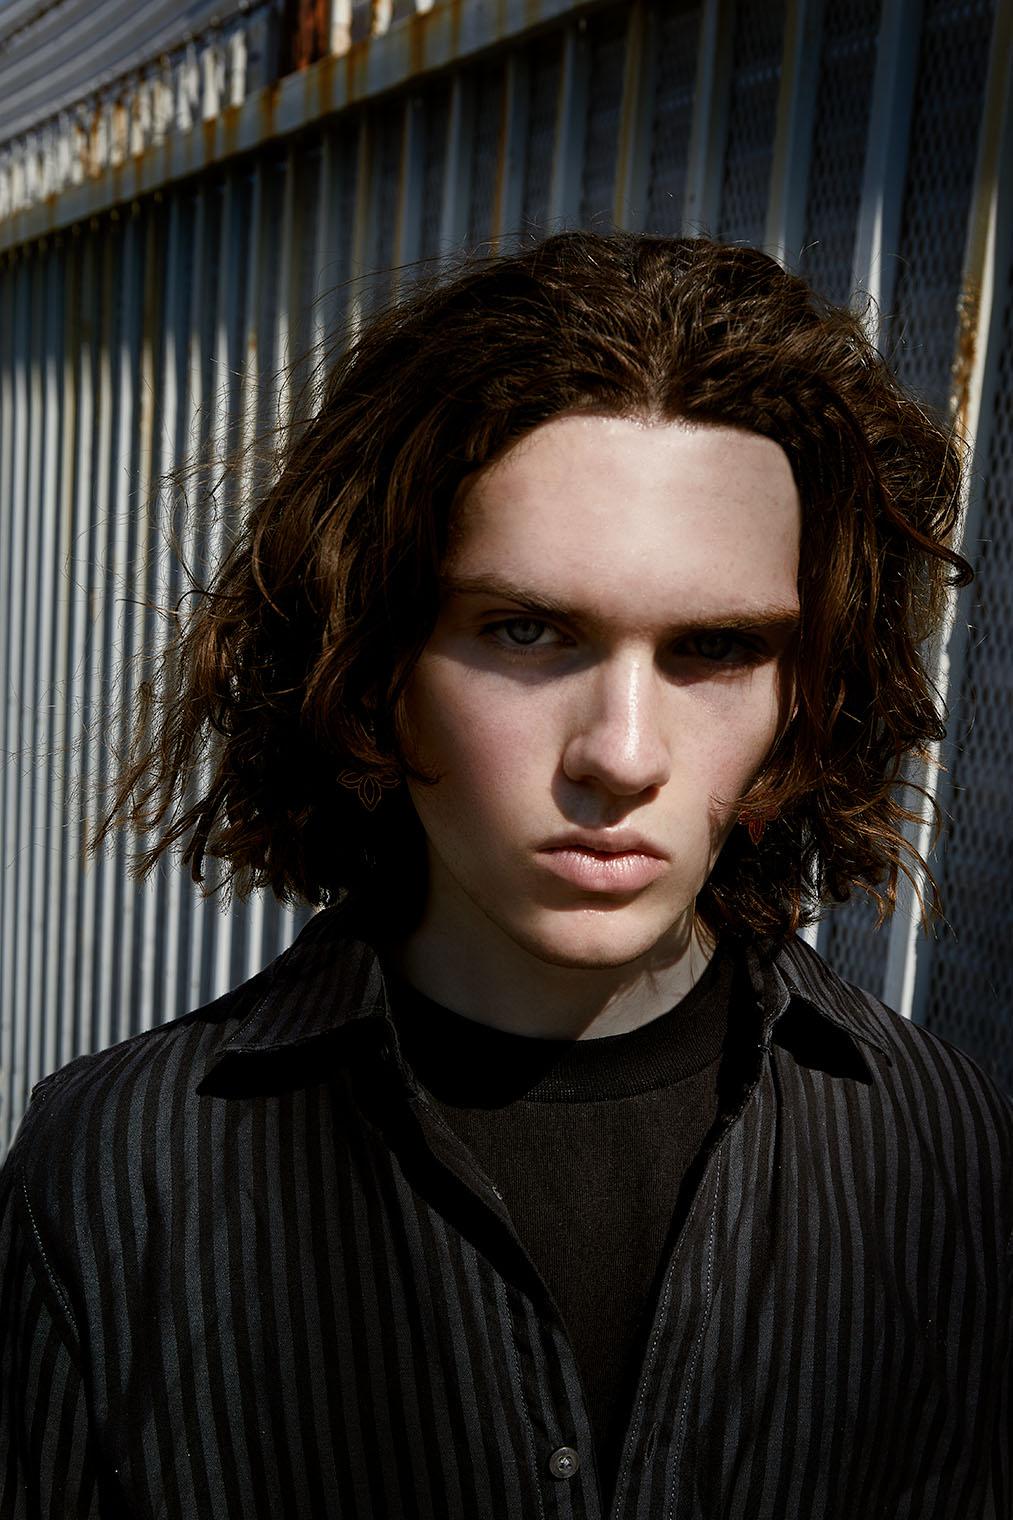 man with long hair - fashion photography - fashion portrait